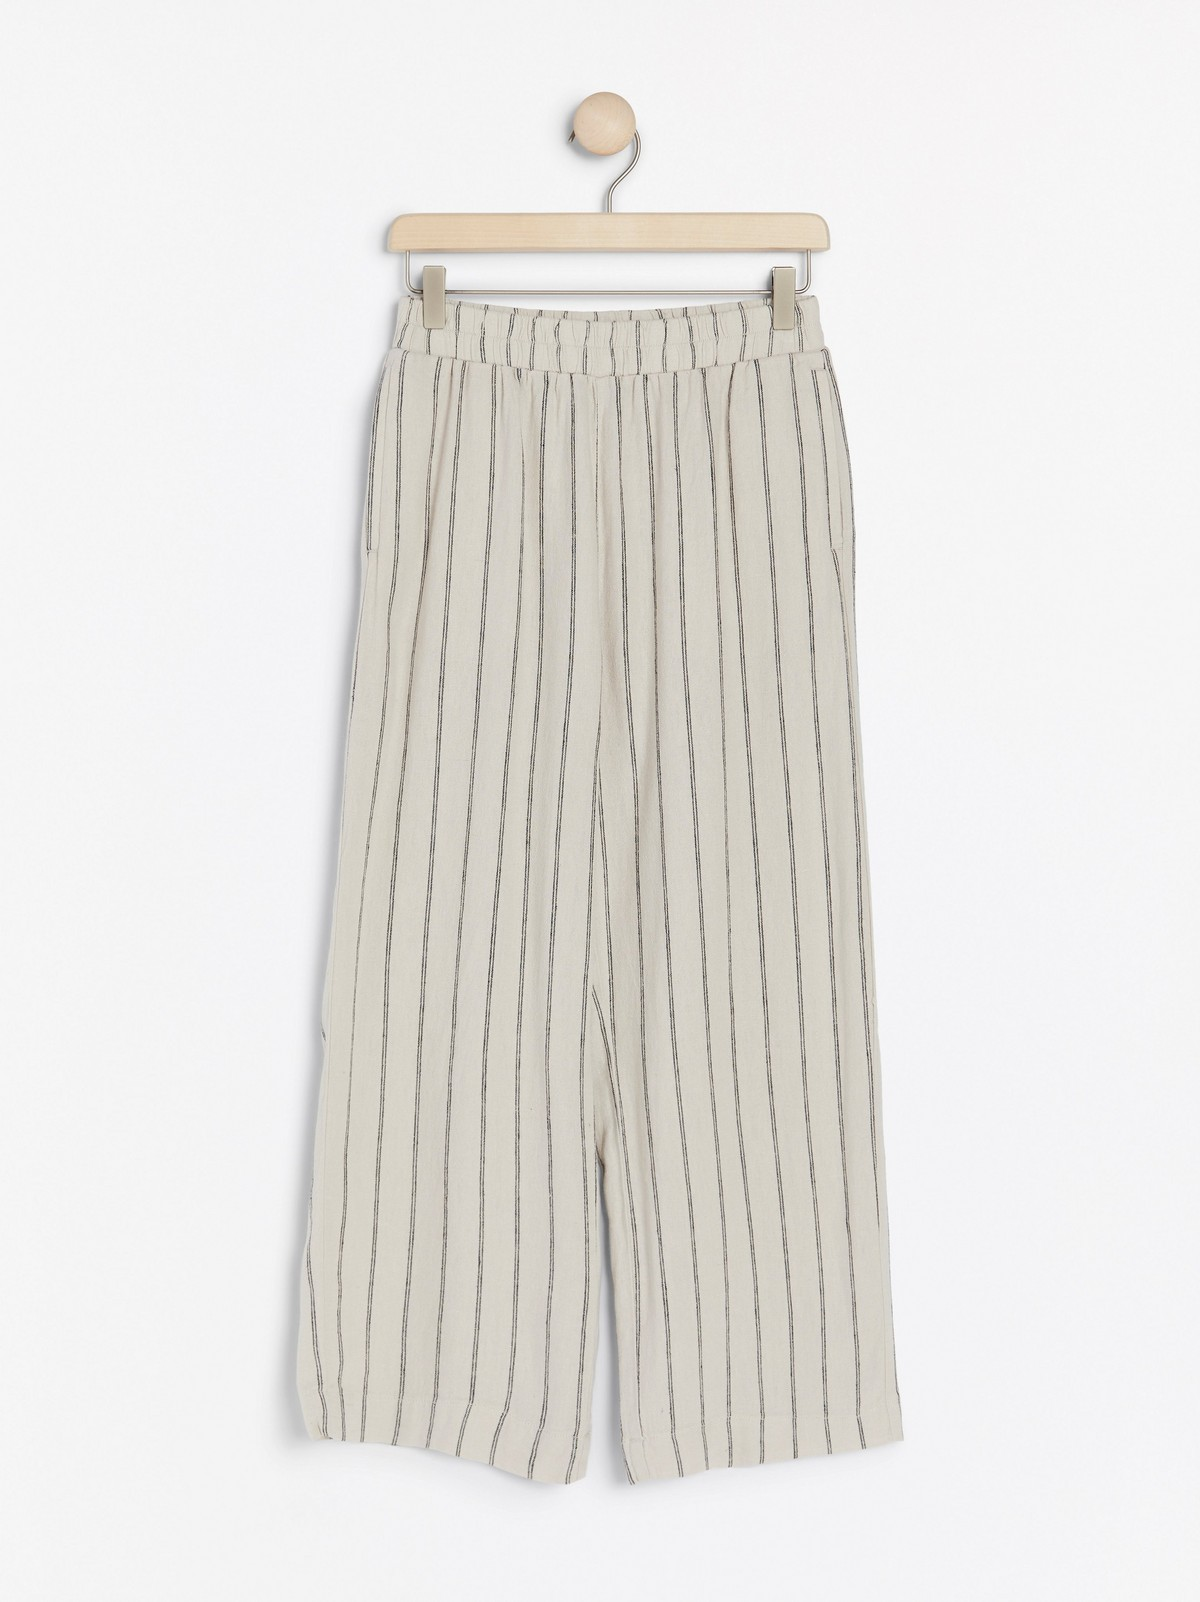 BELLA rett bukse i linblanding